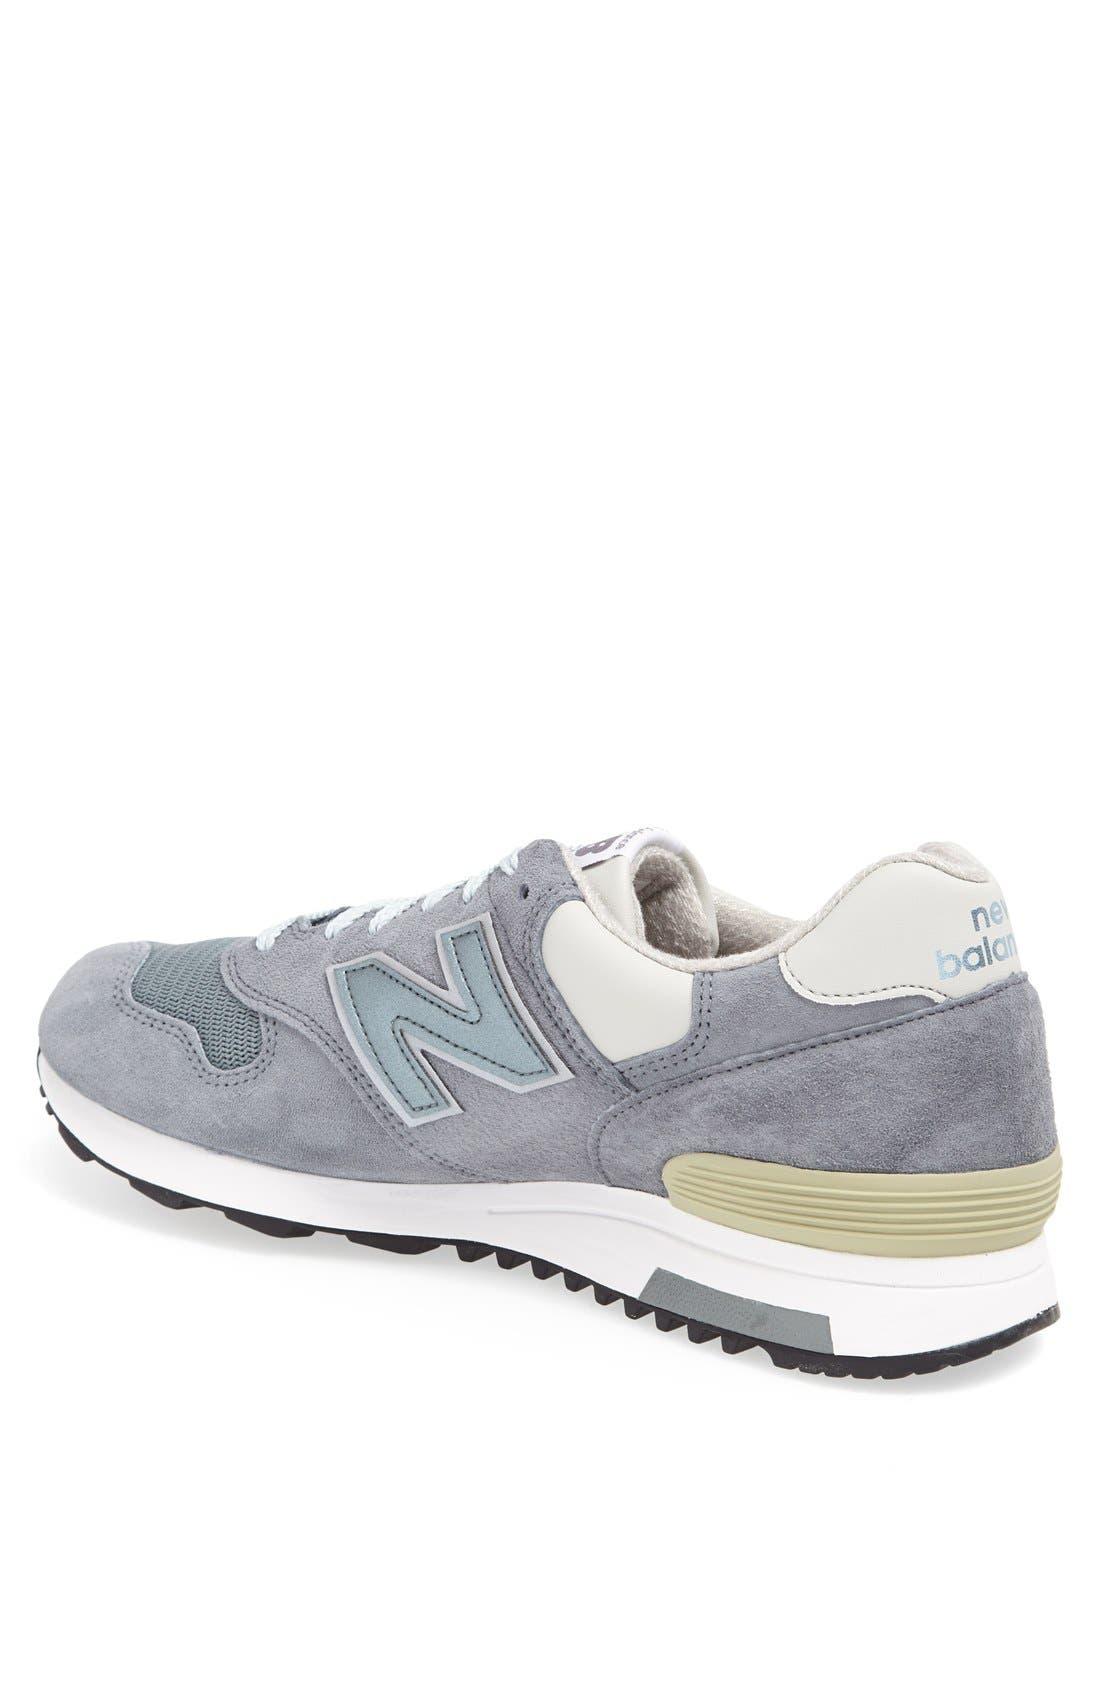 Alternate Image 2  - New Balance '1400' Suede Running Shoe (Men)